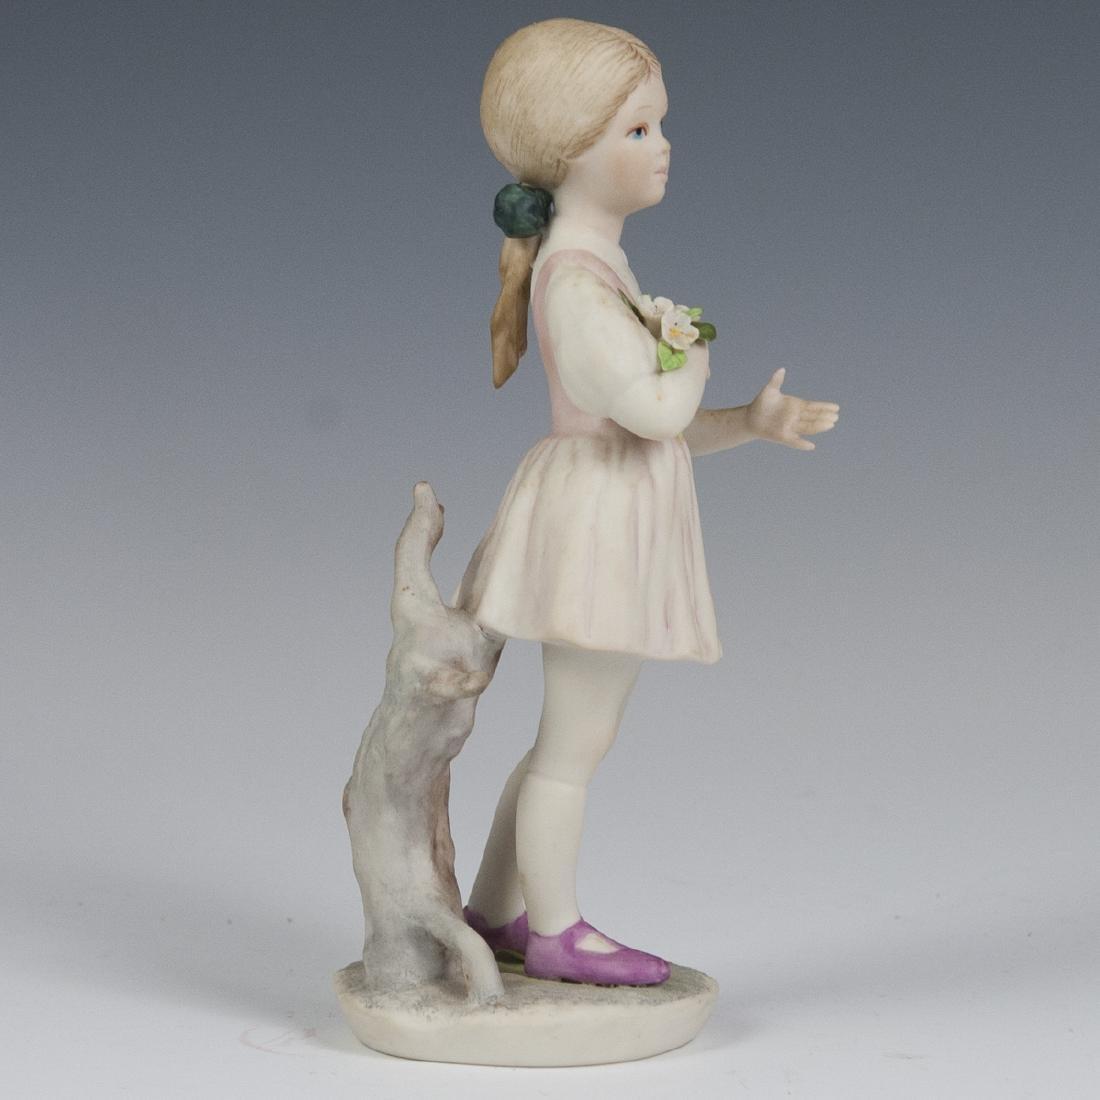 Sybis Bisque Porcelain Figurine - 4